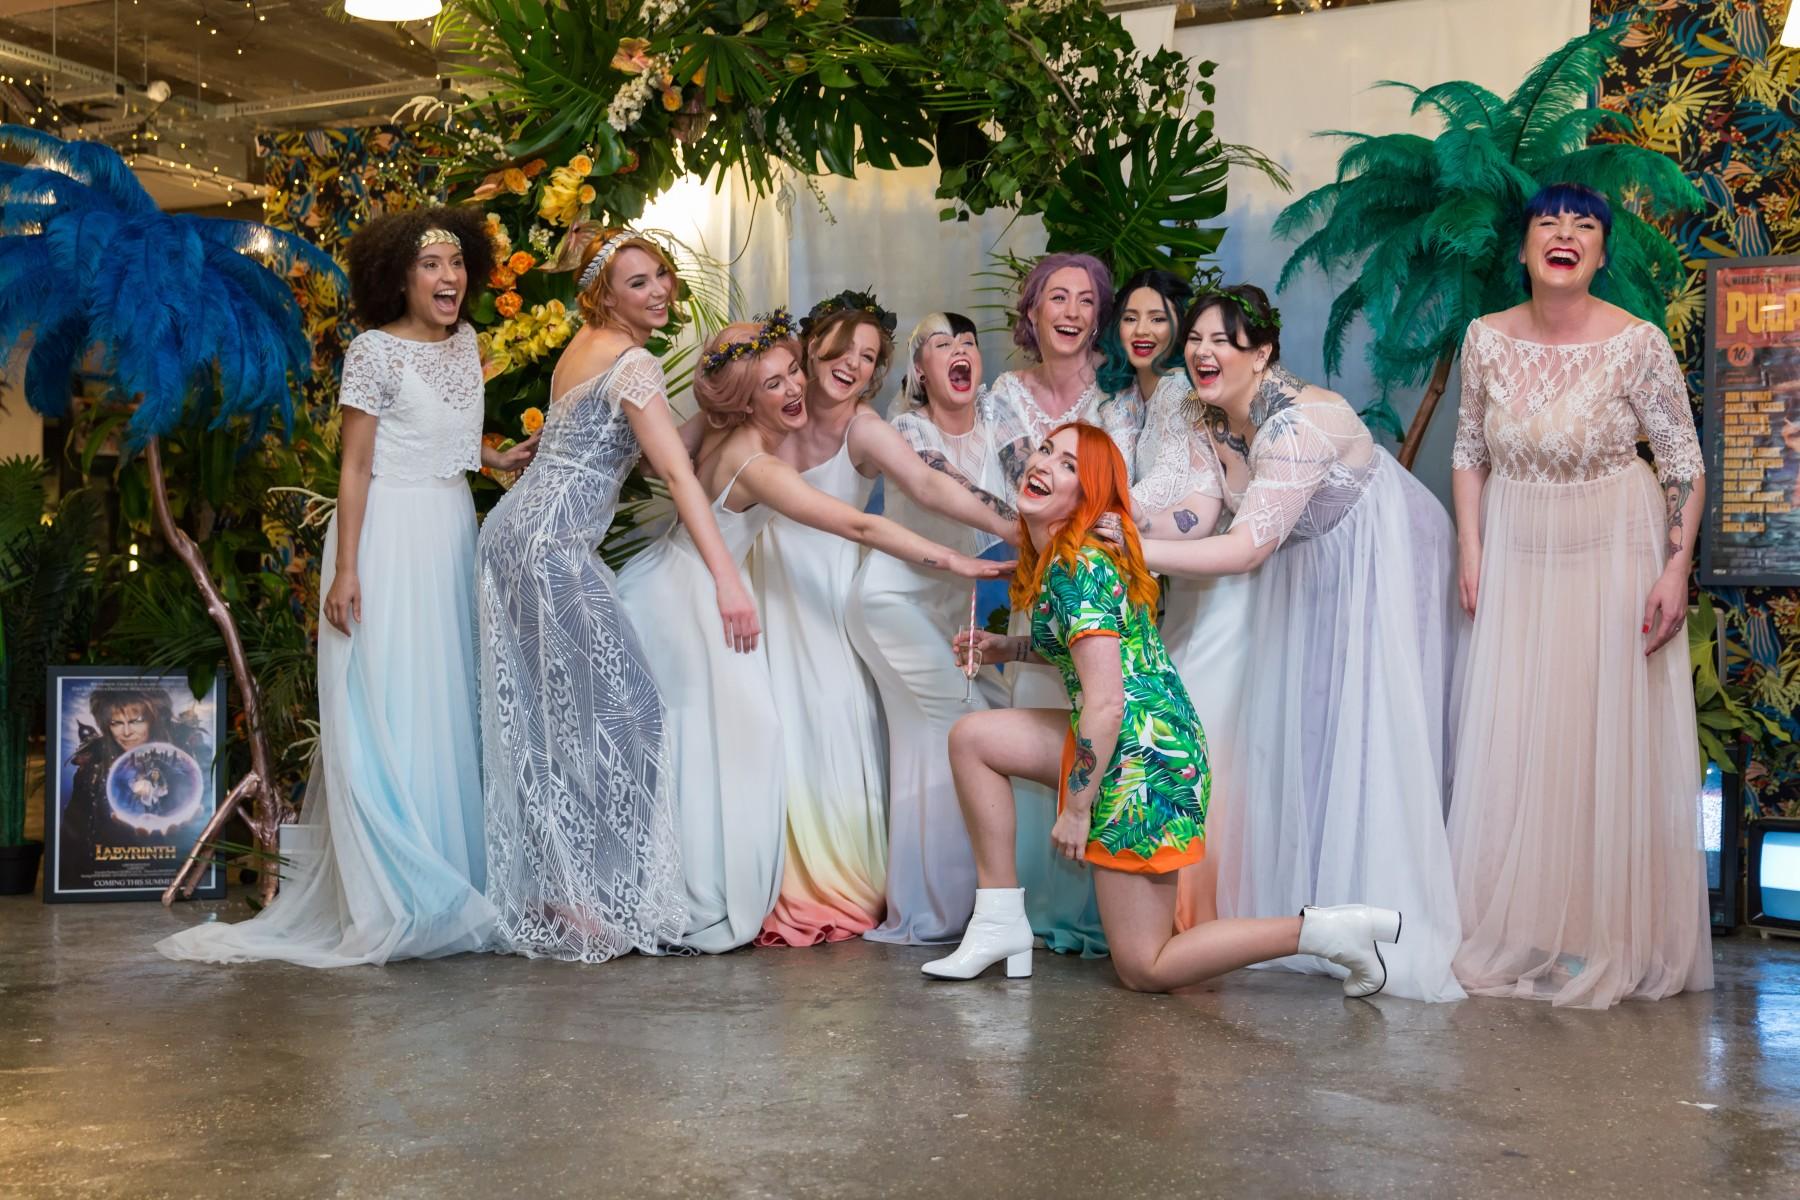 Lucy Can't Dance - Dip Dye Bridal wear - alternative wedding dress - Jodi Hanagan Photography - unusual wedding dress